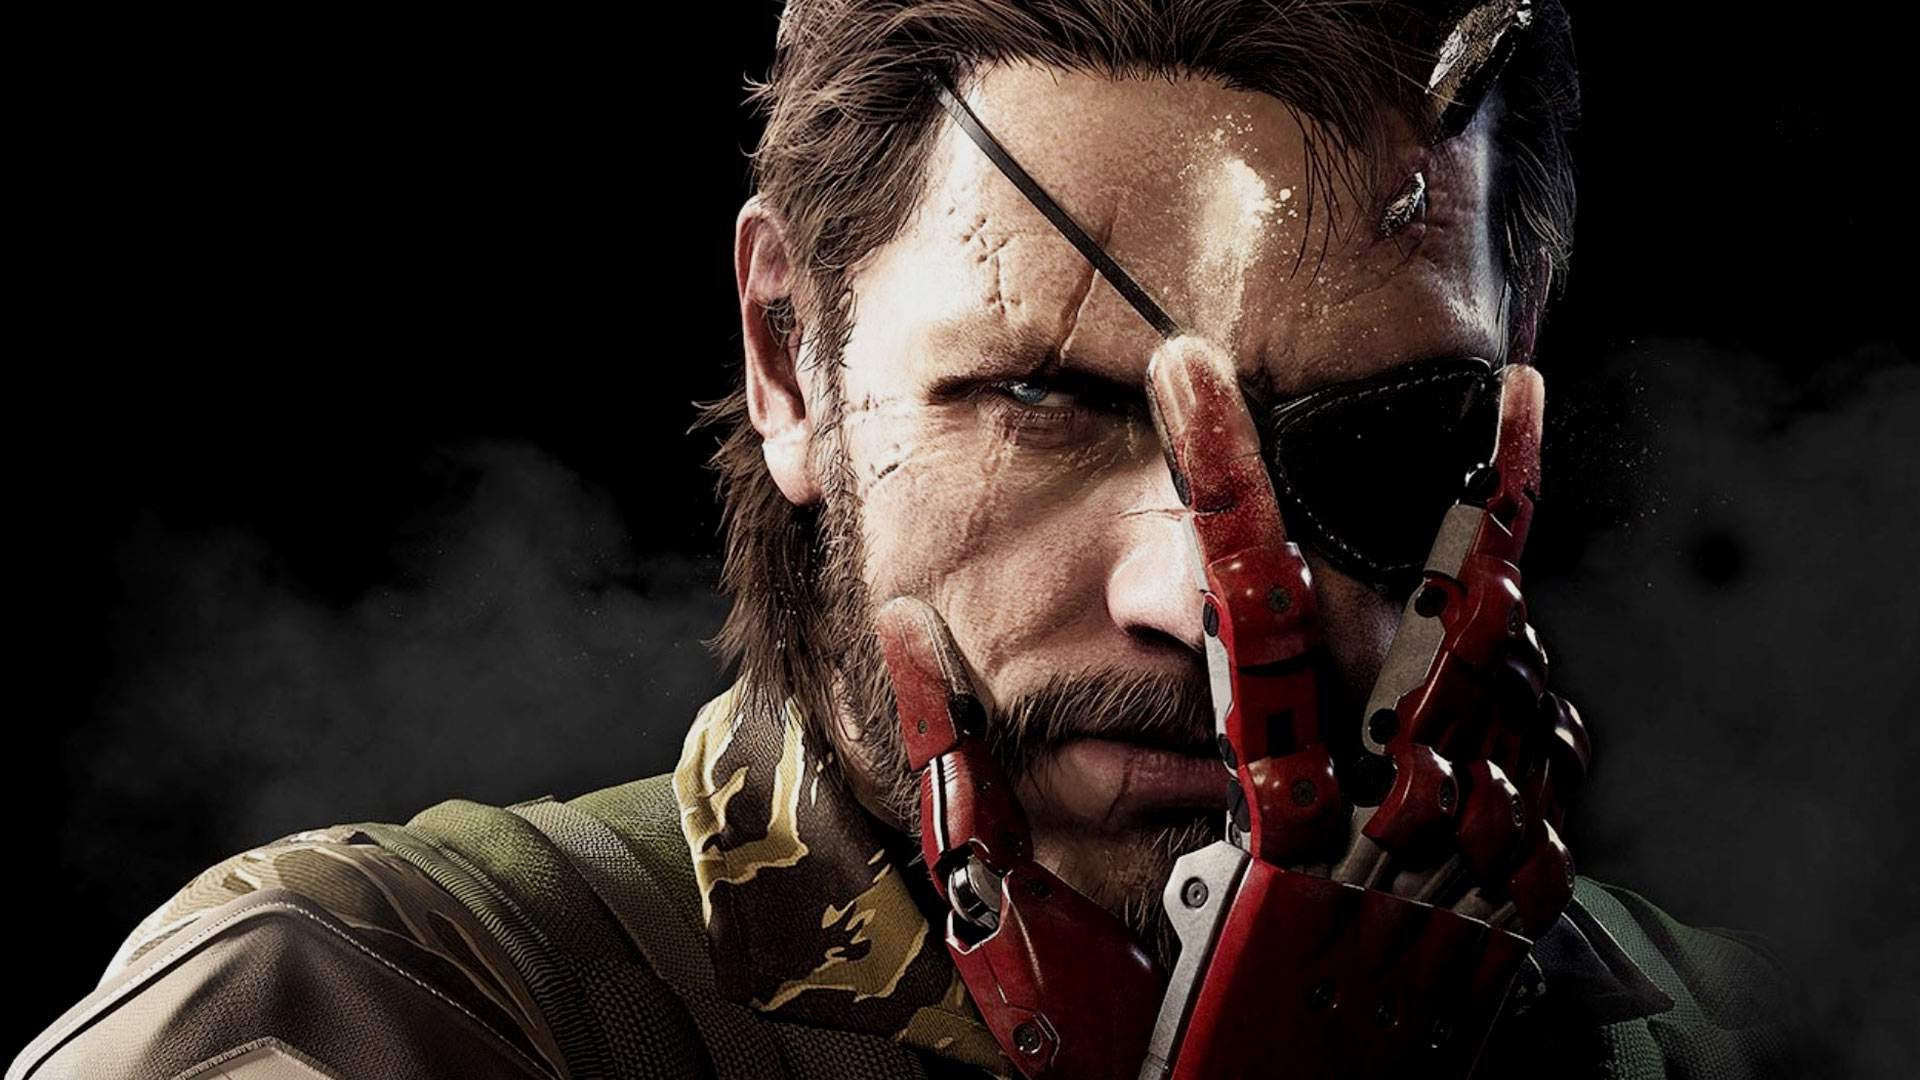 big-boss-bionic-arm-metal-gear-solid-v-the-phantom-pain-wallpaper-hd-desktop